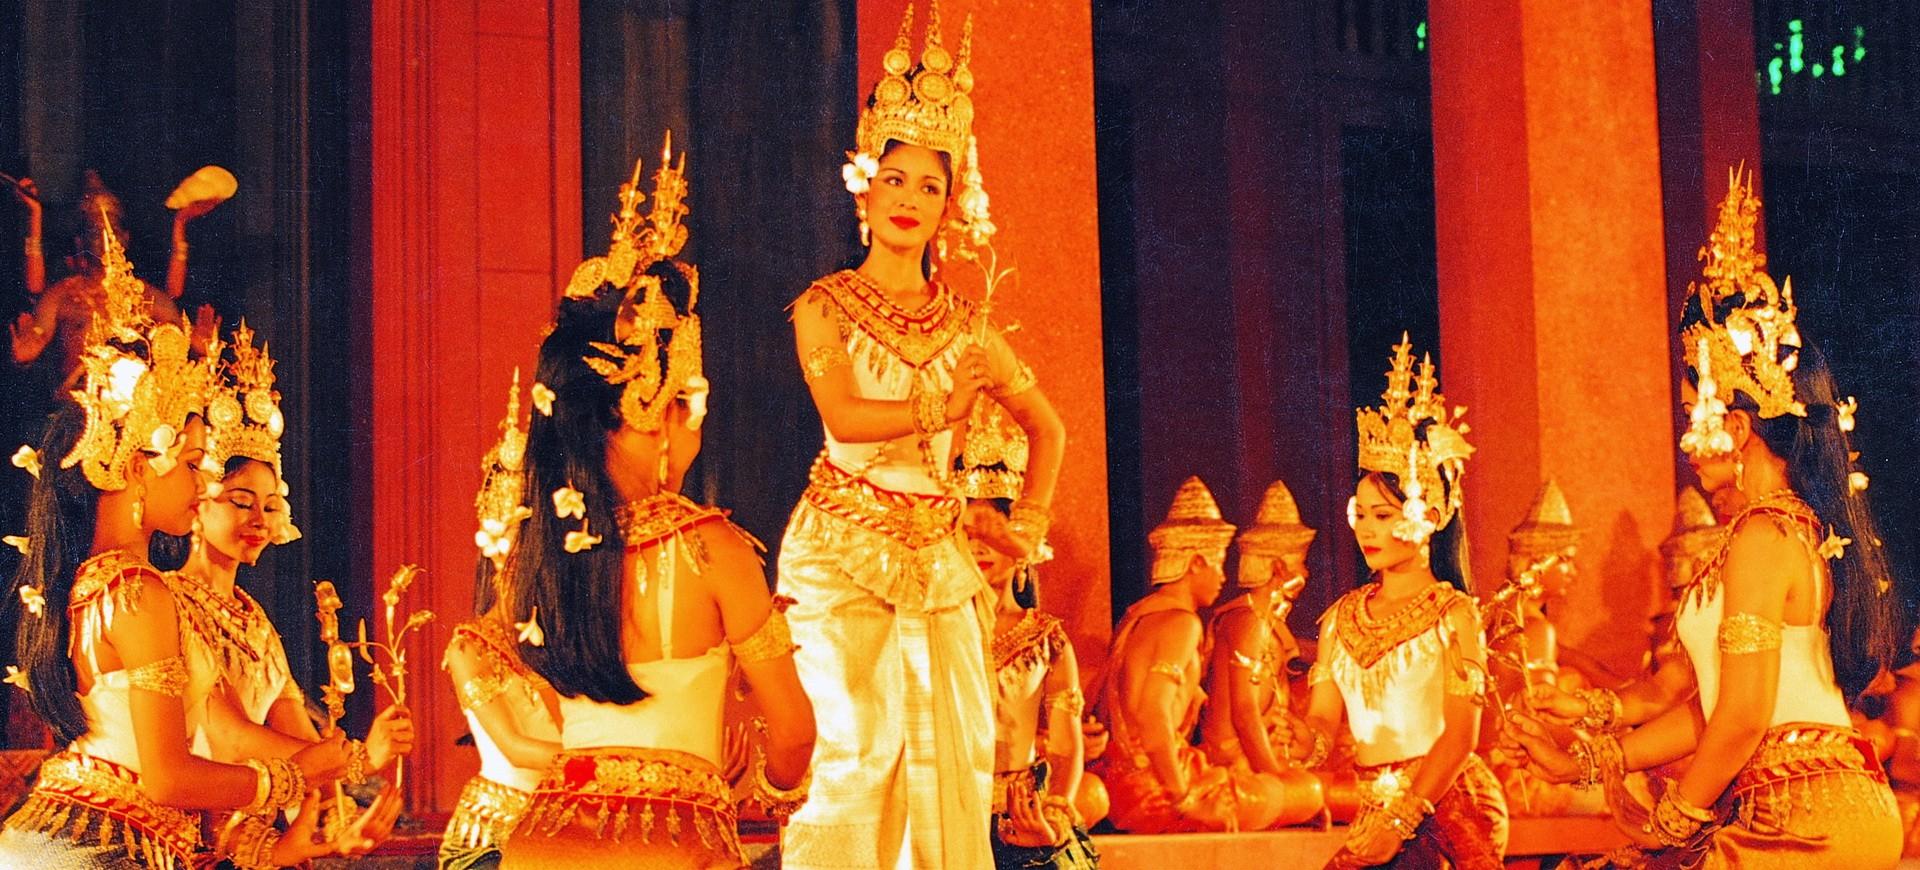 Cambodge spectacle de danses classiques